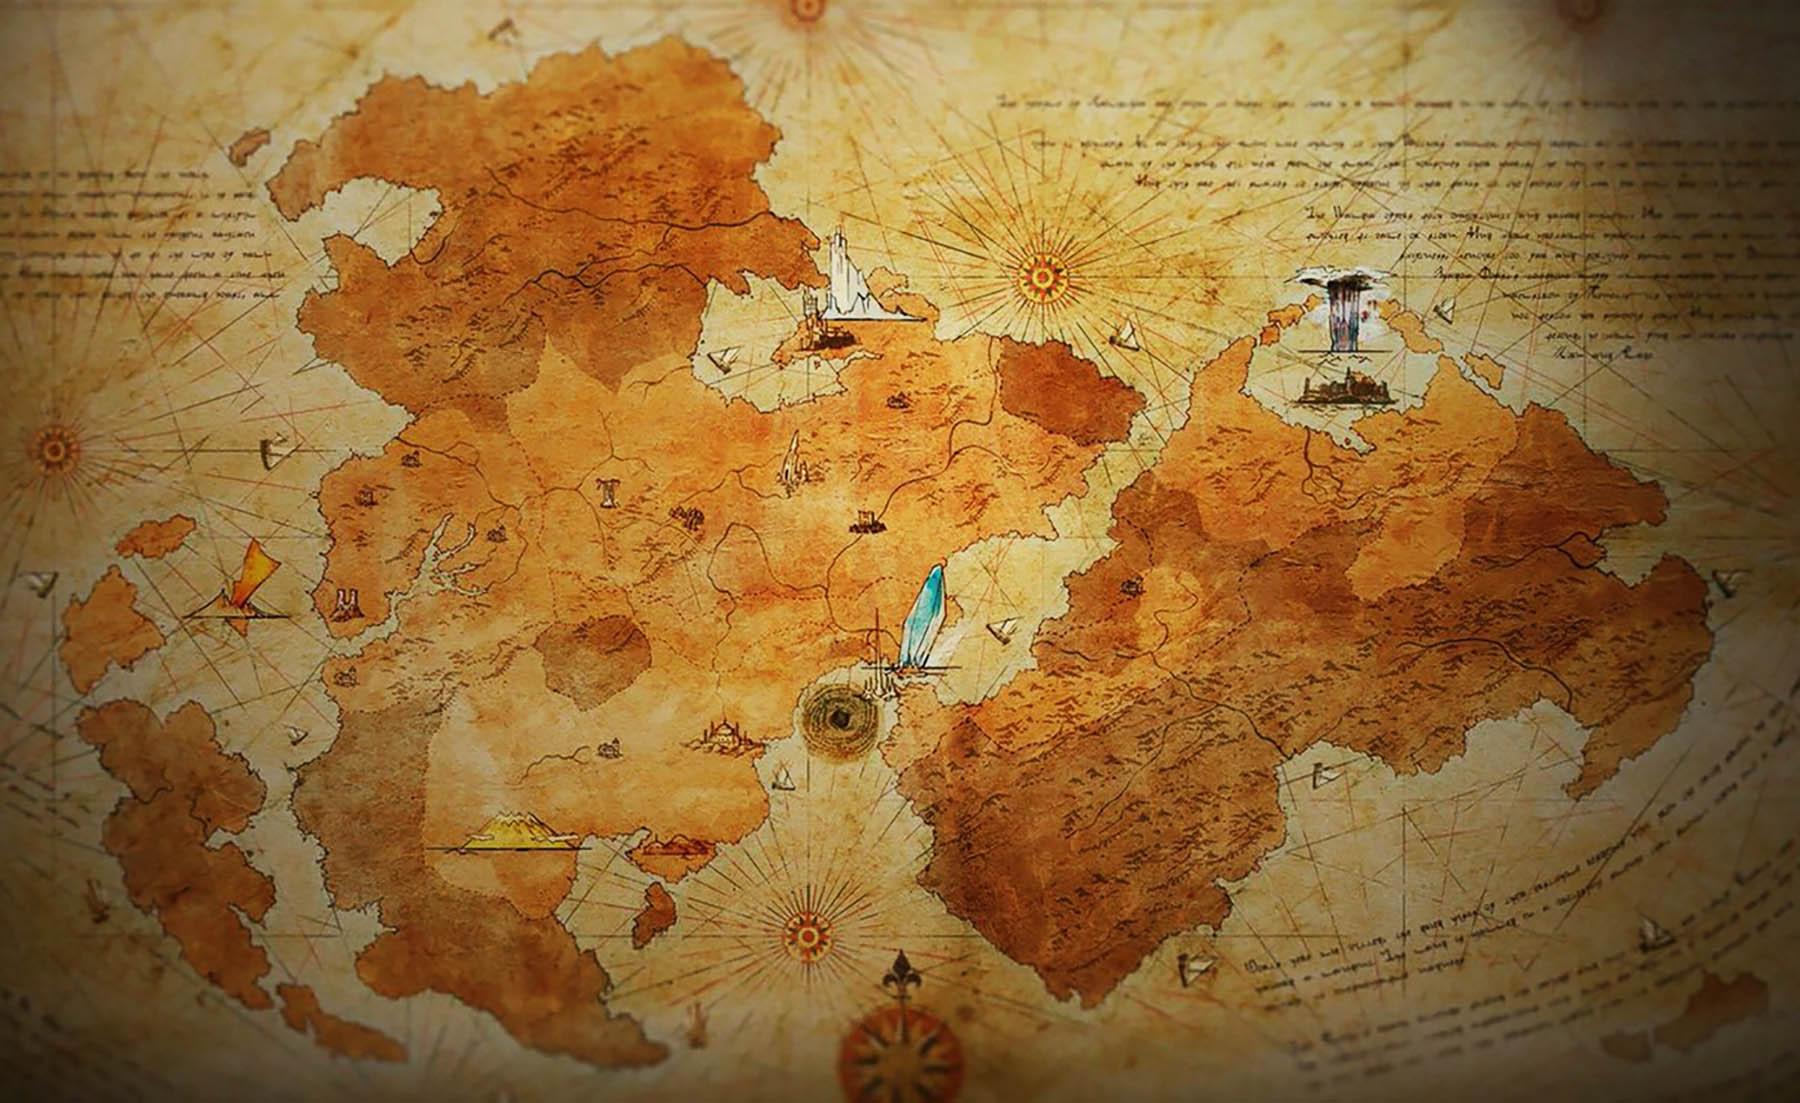 finalfantasy-xvi-world-map